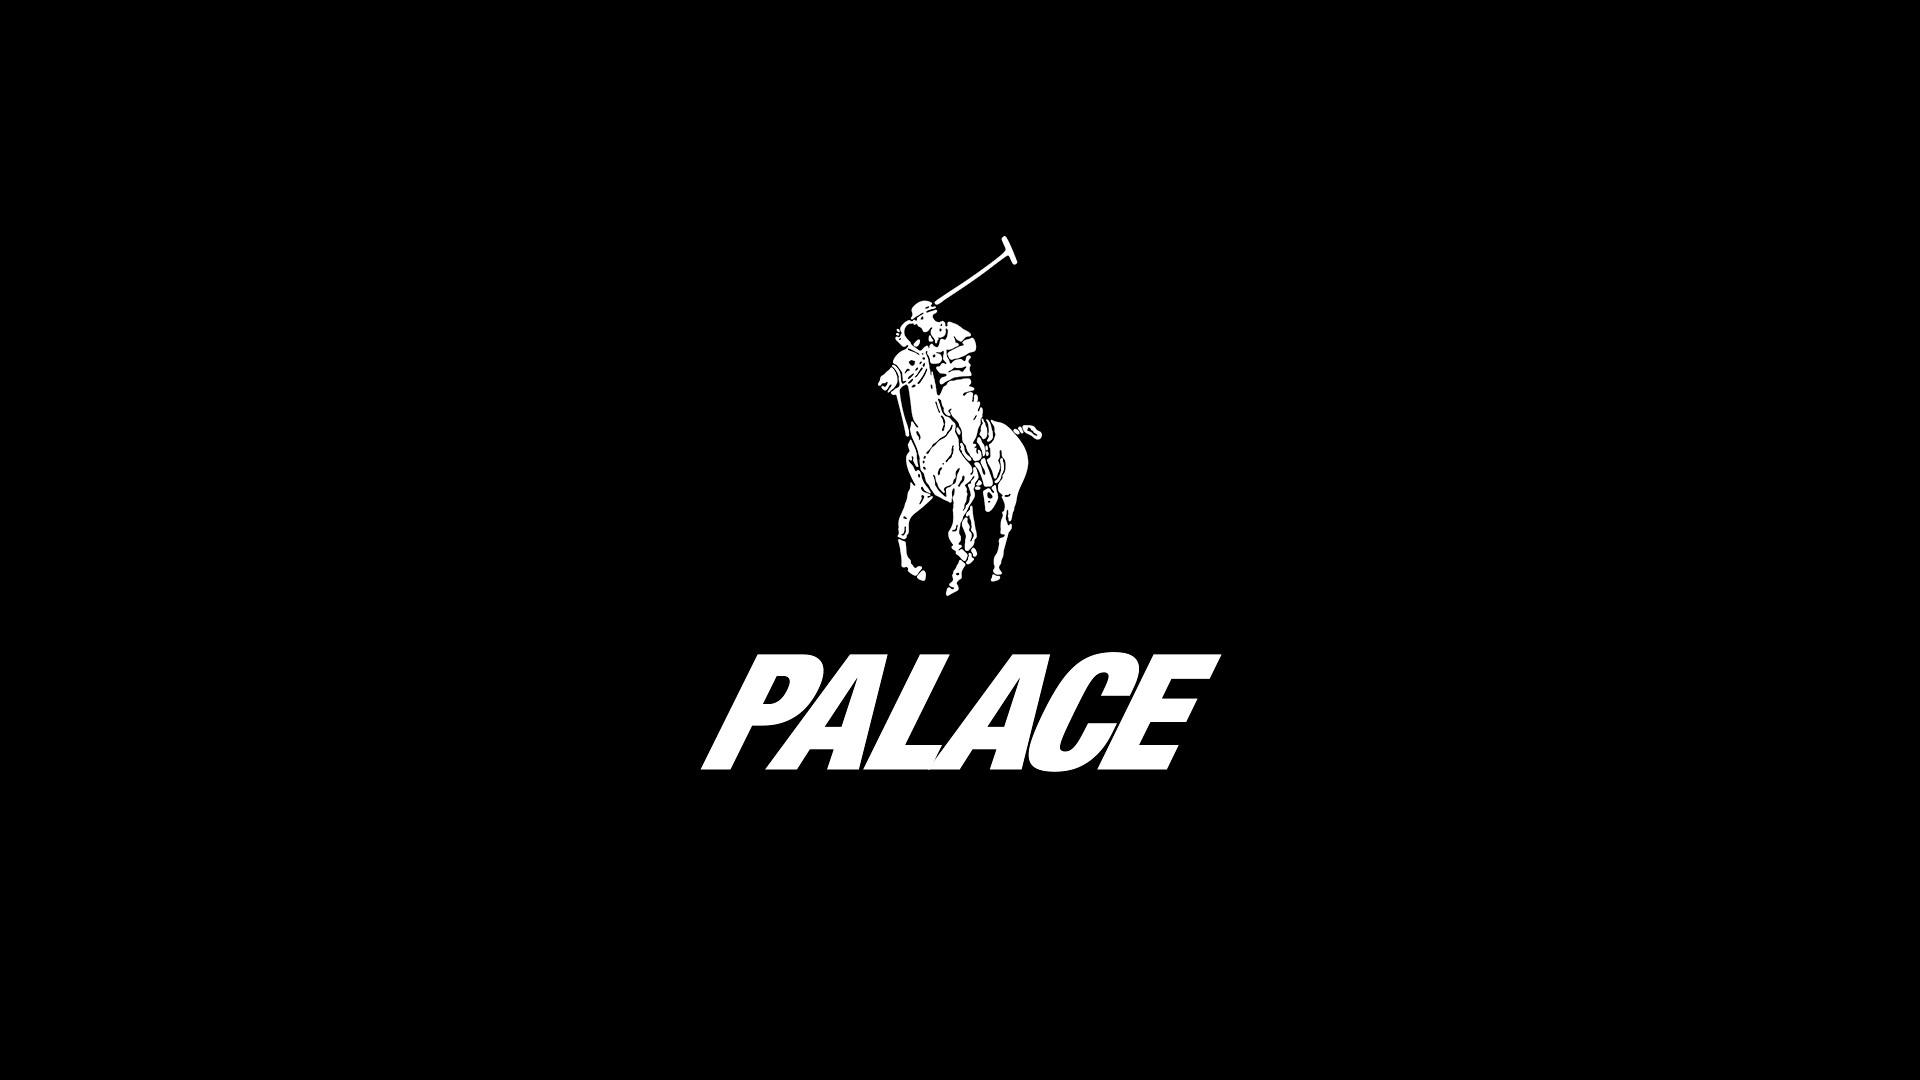 Polo Logo Wallpaper (60+ images)